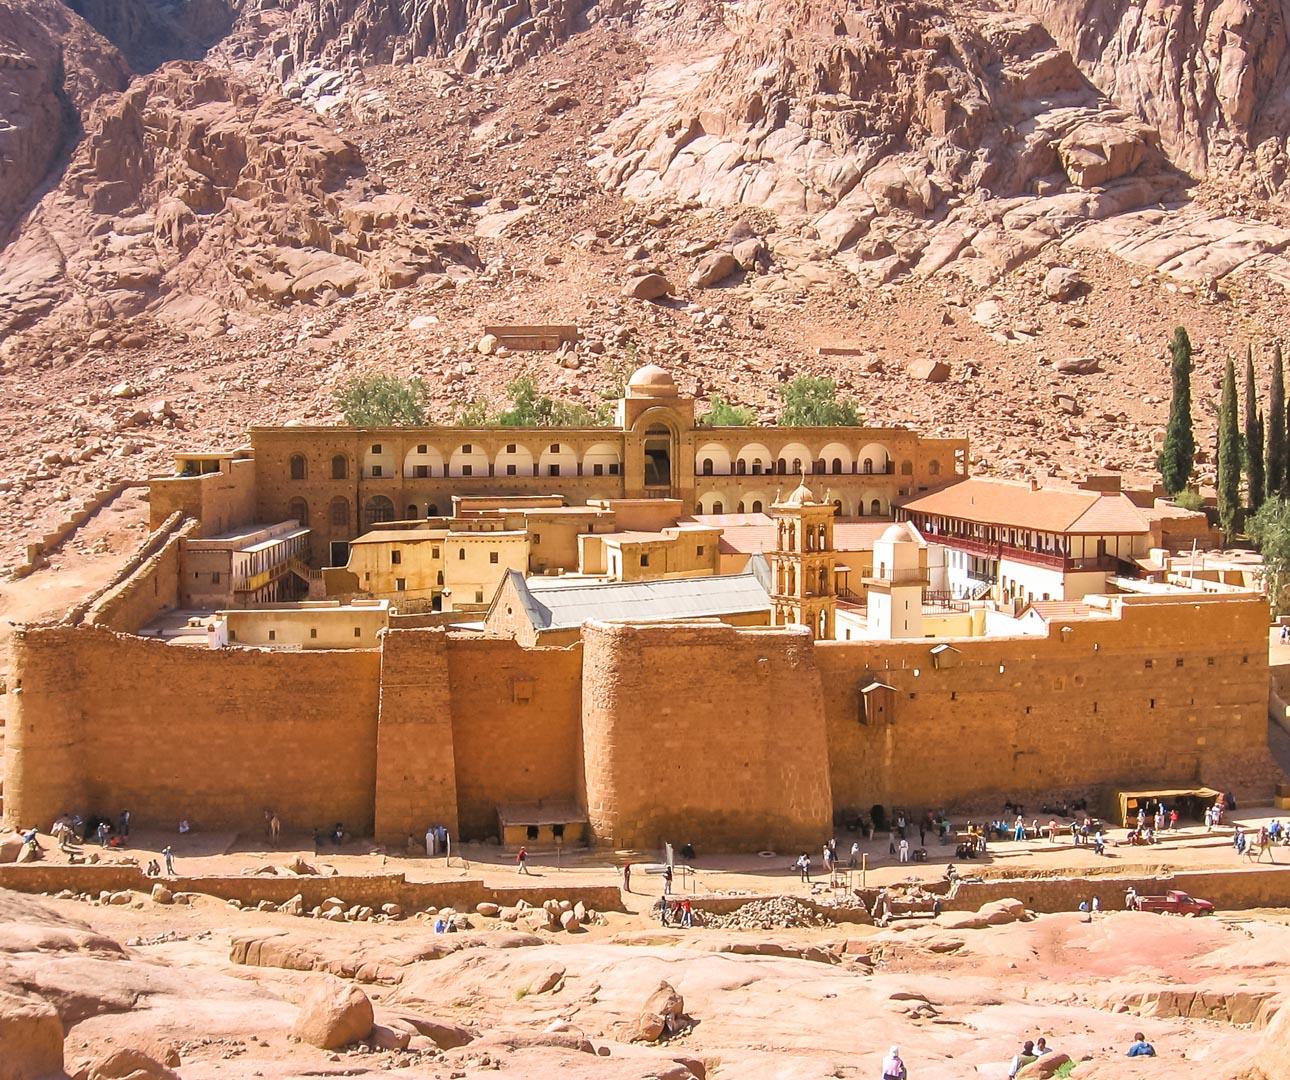 Monastery of St. Catherine Egypt